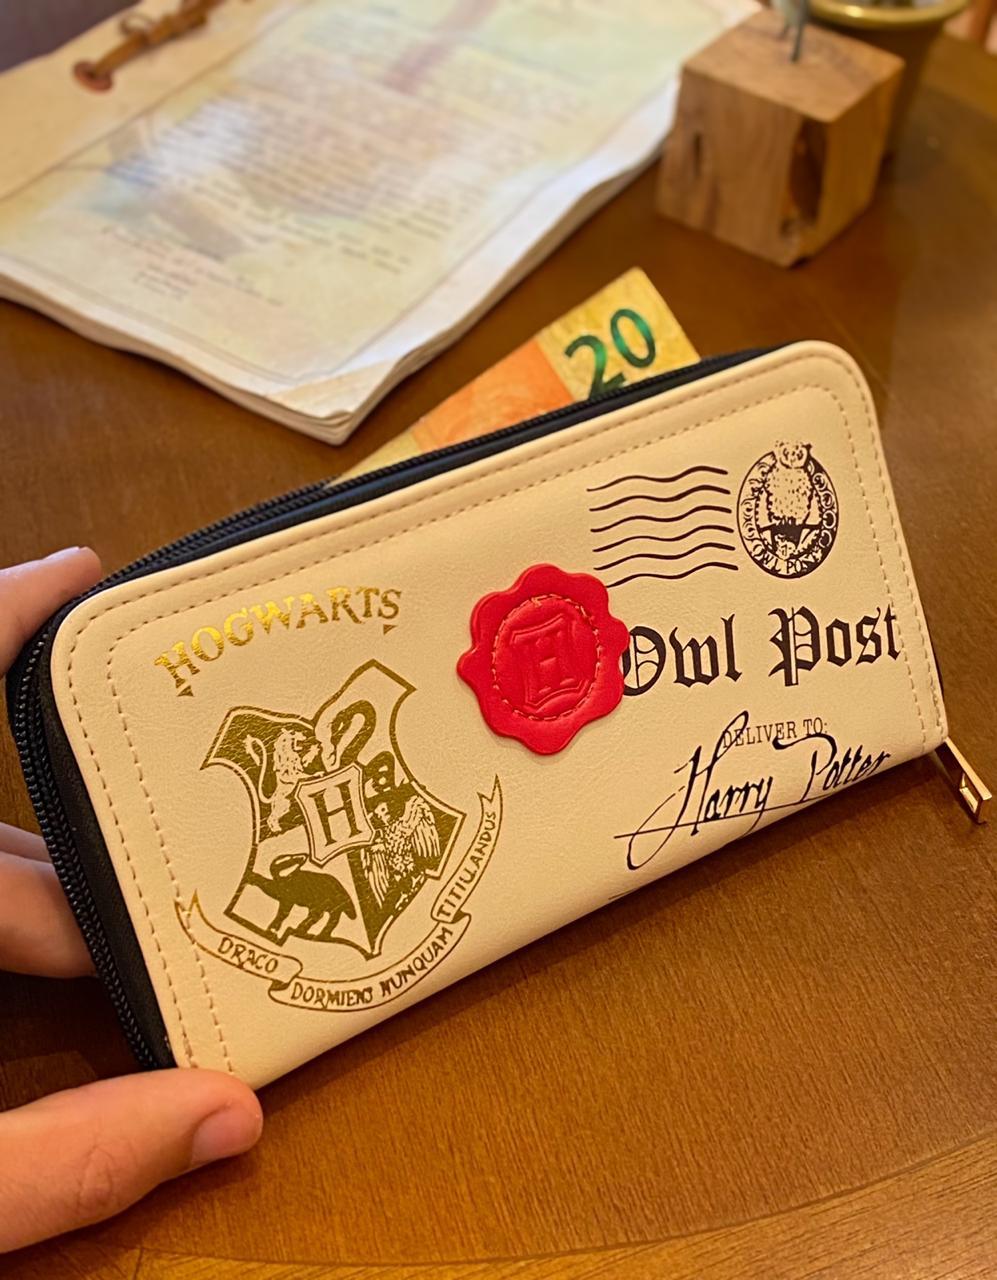 Carteira Retangular: ''Owl Post, Deliver To Harry Potter'' Hogwarts - Harry Potter